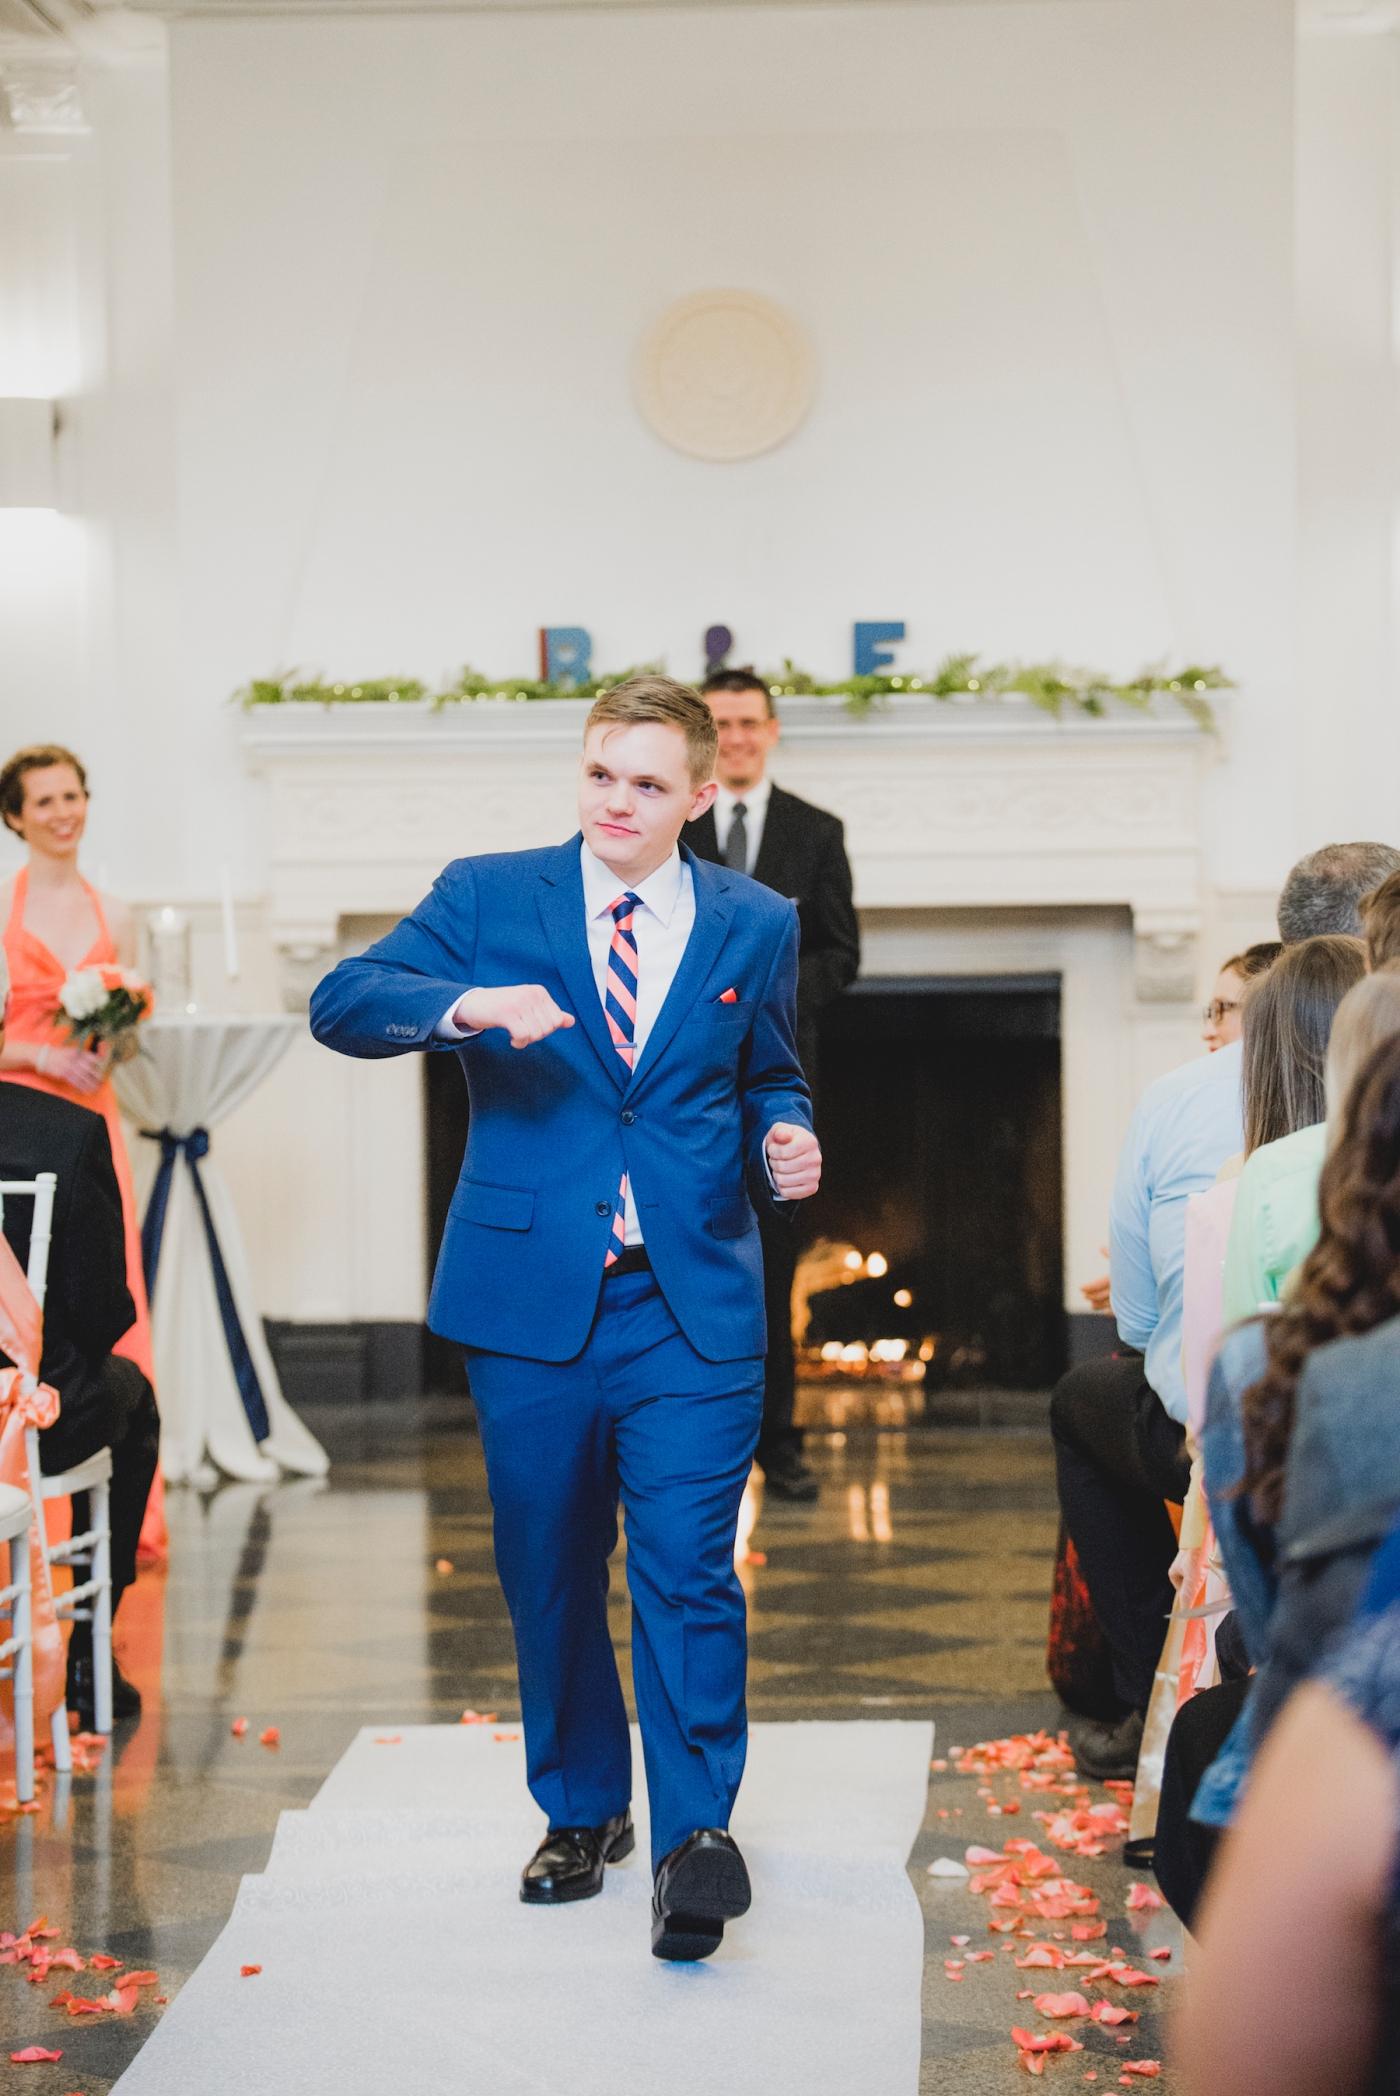 DSC_2769Everett_Wedding_Ballroom_Jane_Speleers_photography_Rachel_and_Edmund_Ceremony_2017